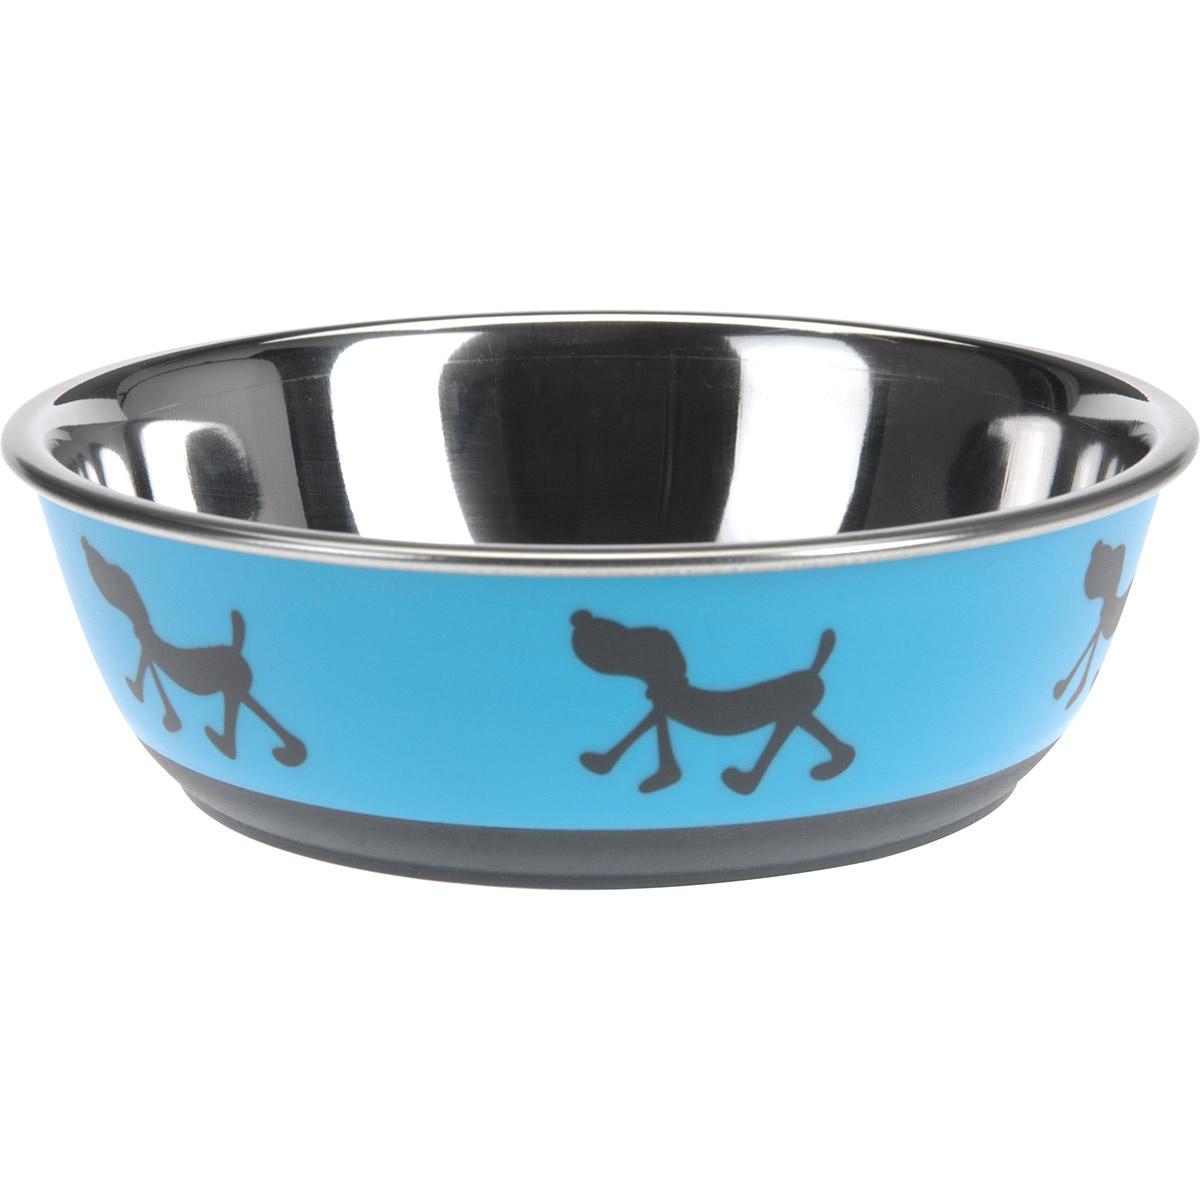 Fotografie Miska pro psa Doggie treat modrá, pr. 17,5 cm